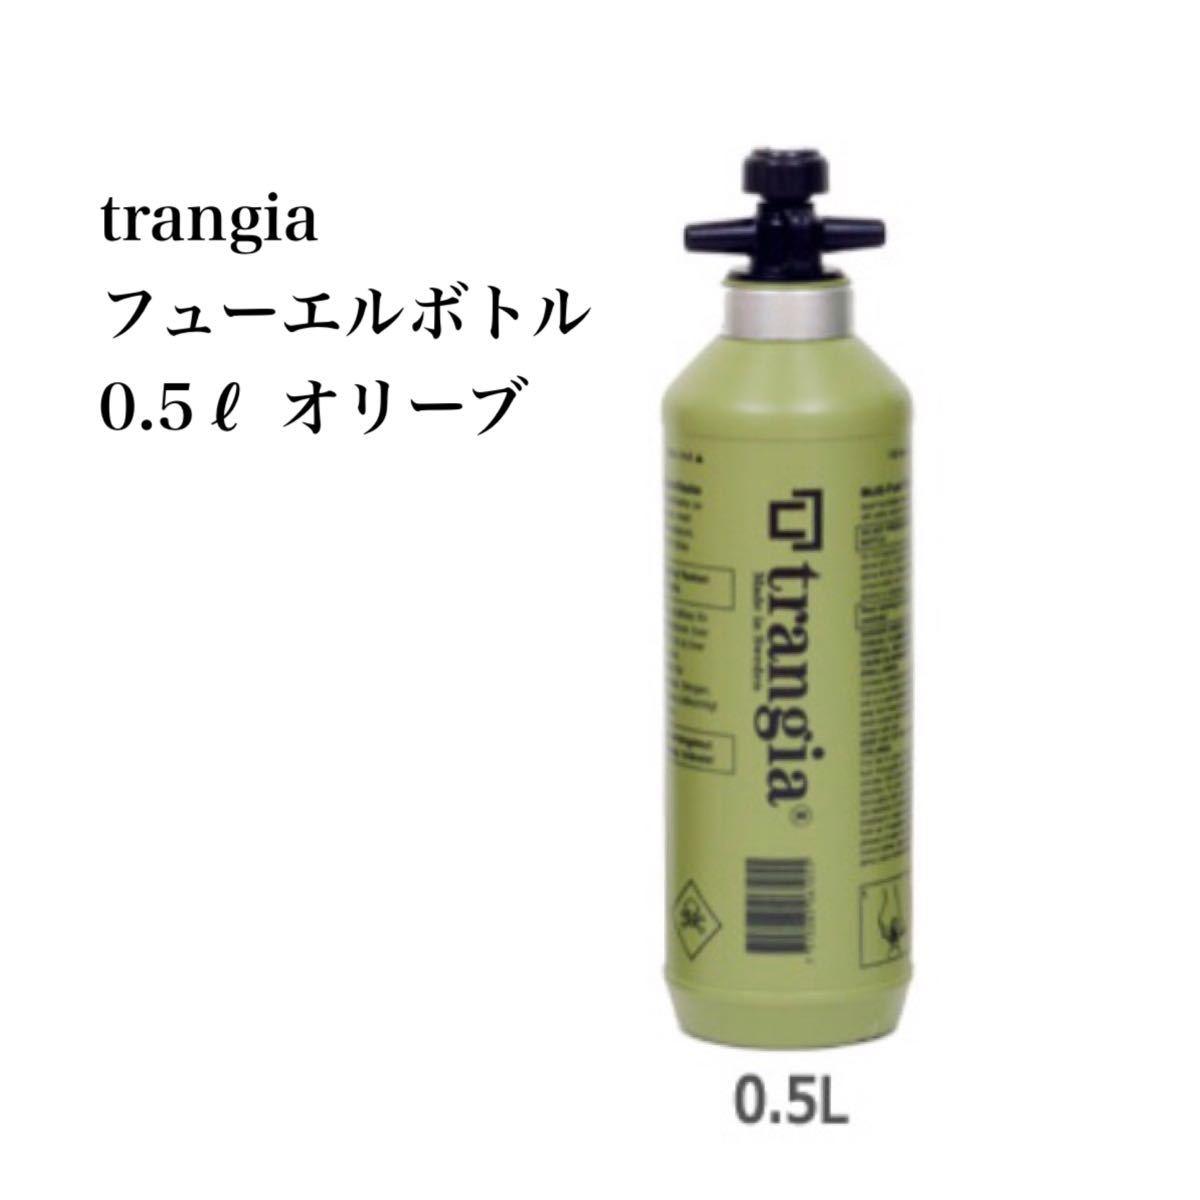 trangia トランギア フューエルボトル 0.5L オリーブ 新品 燃料ボトル